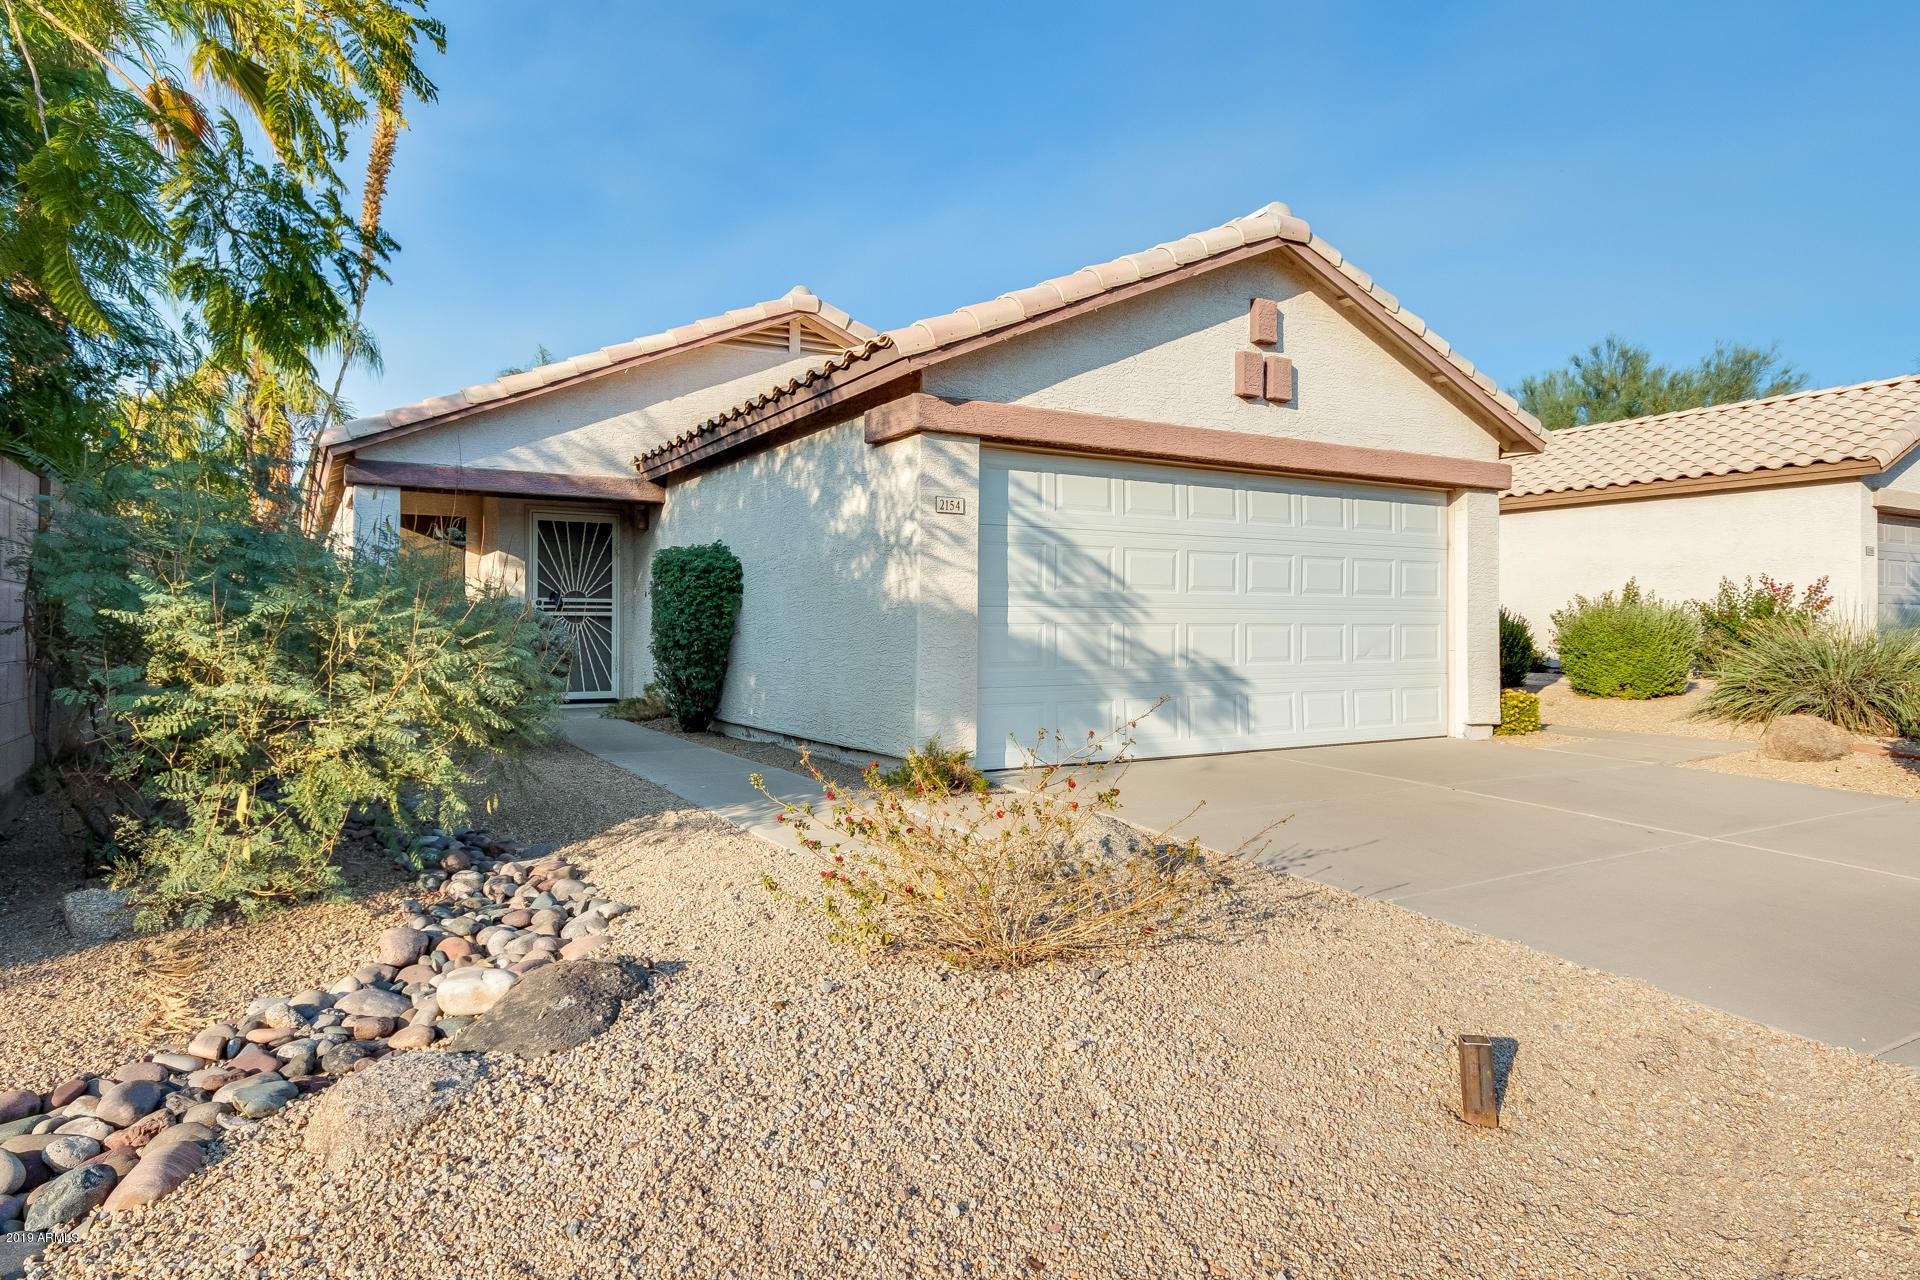 Photo of 2154 E CREST Lane, Phoenix, AZ 85024